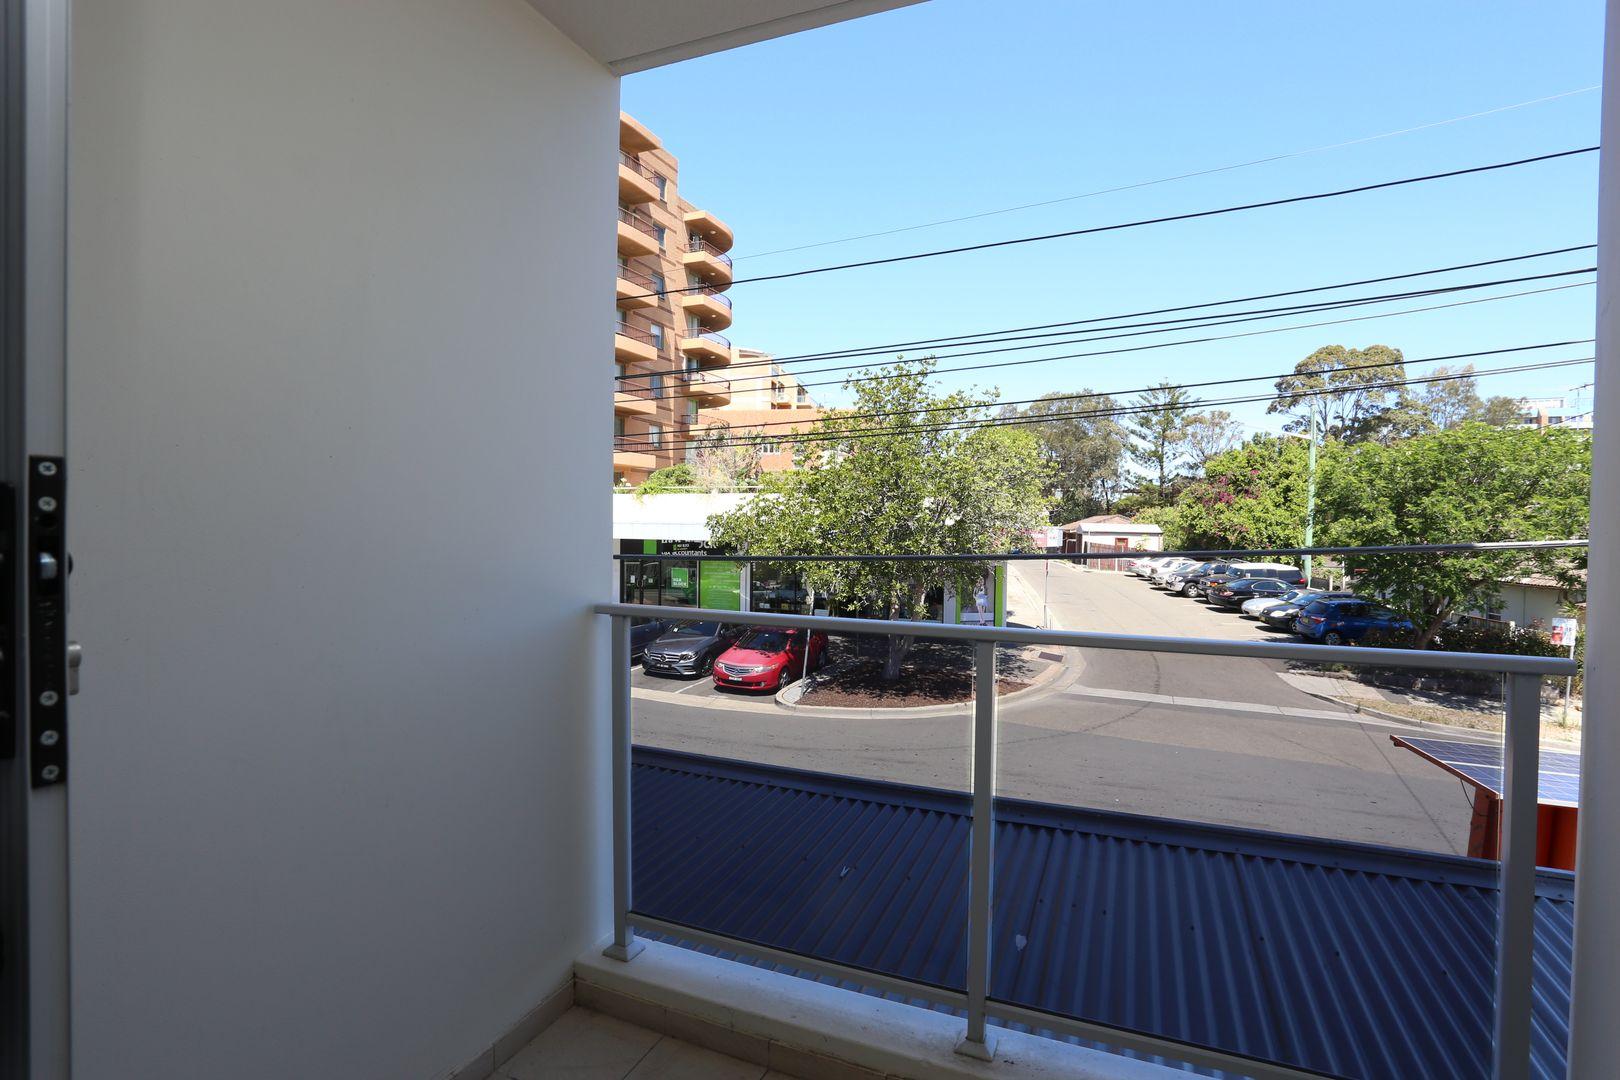 S3/46 Borrodale Road, Kingsford NSW 2032, Image 0